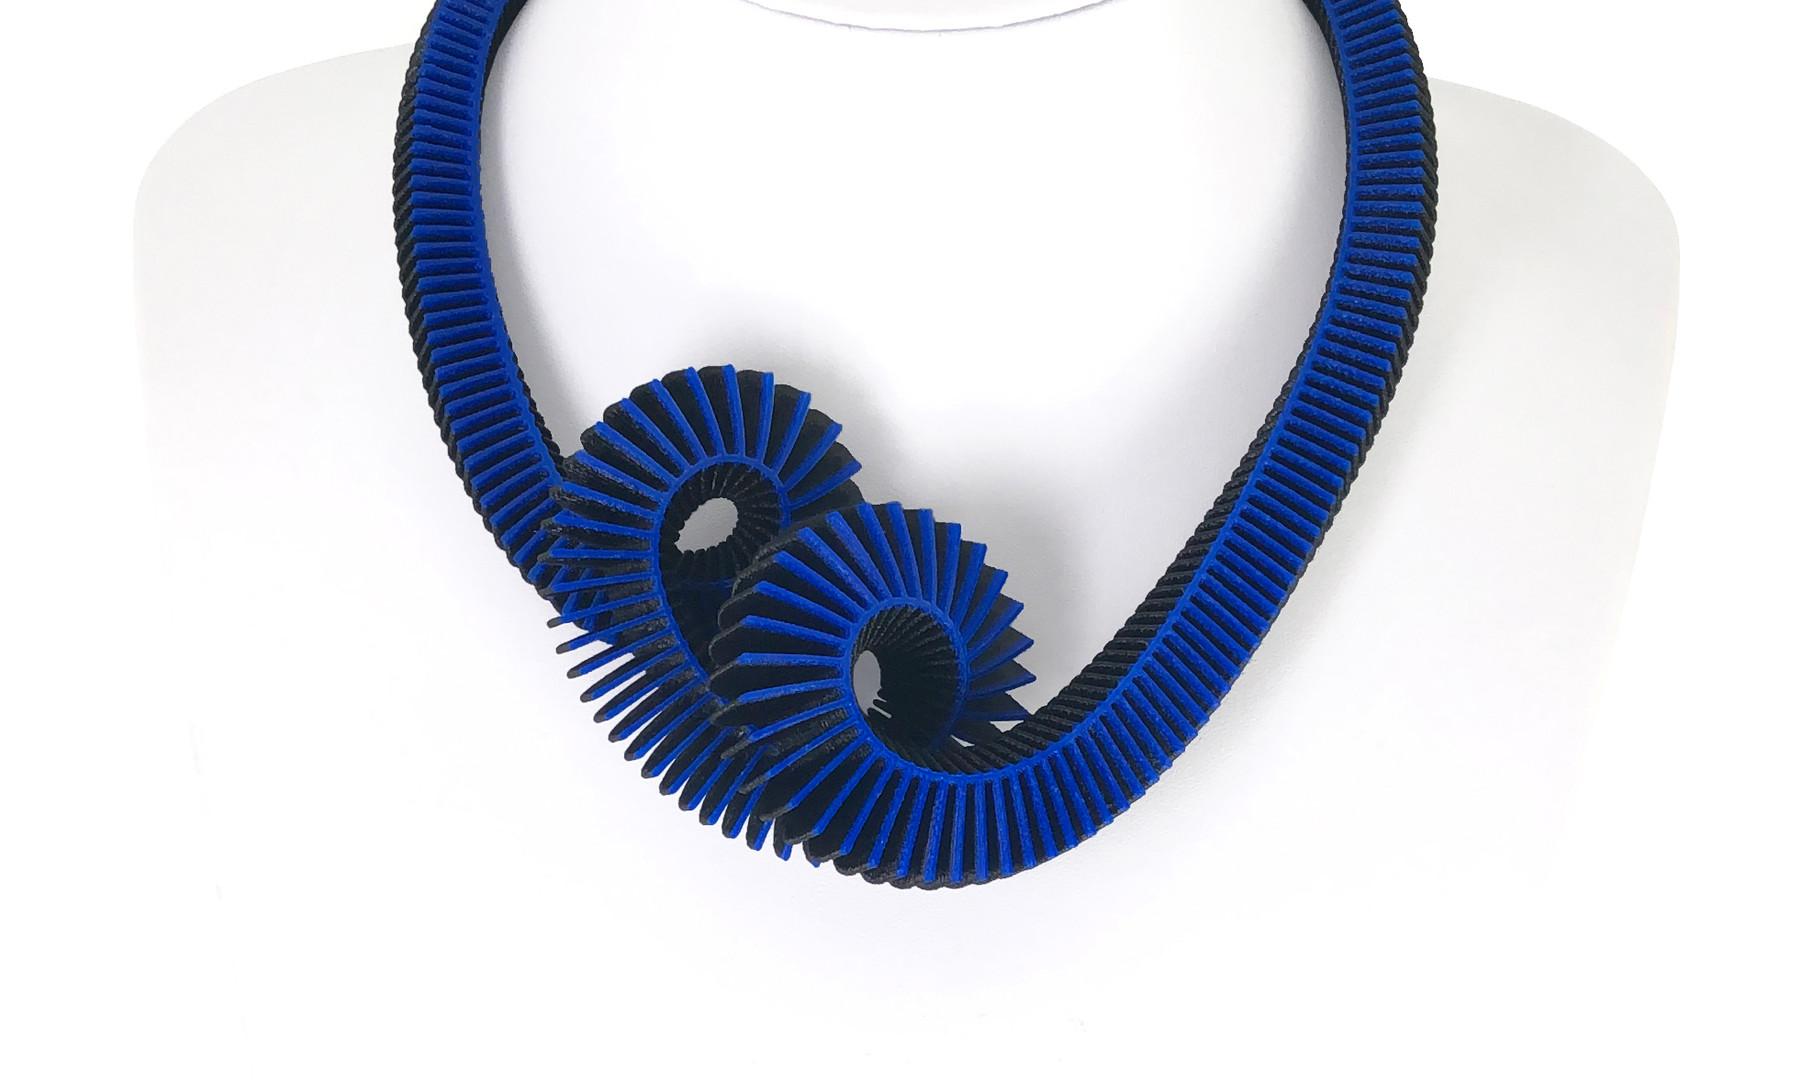 191228_HELIX_Blue-Black_02.jpg